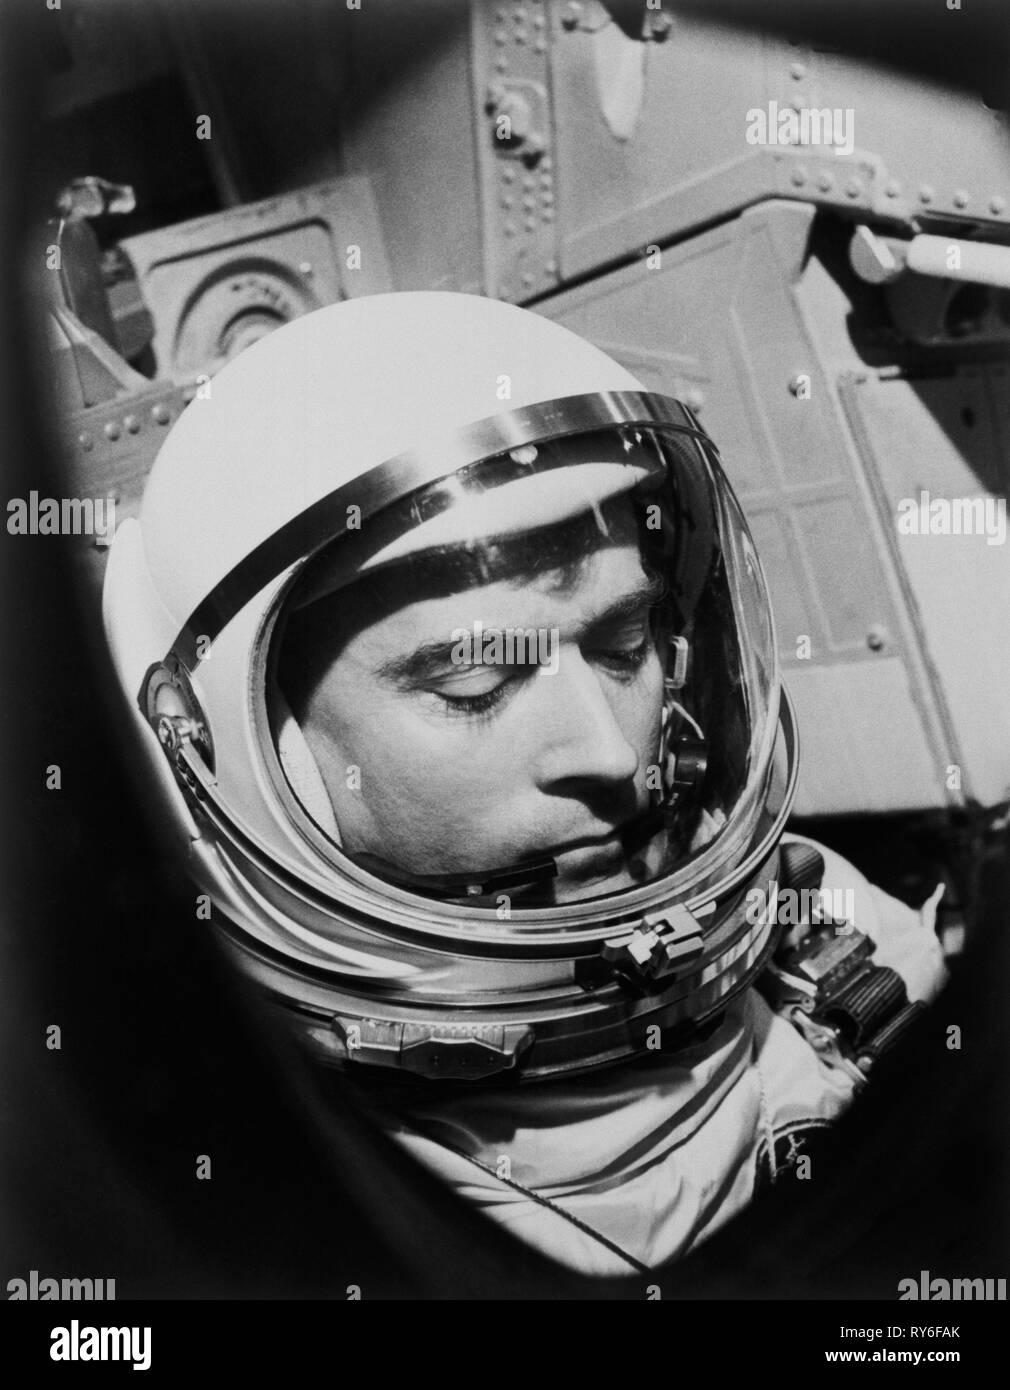 Astronaut John W. Young - Stock Image